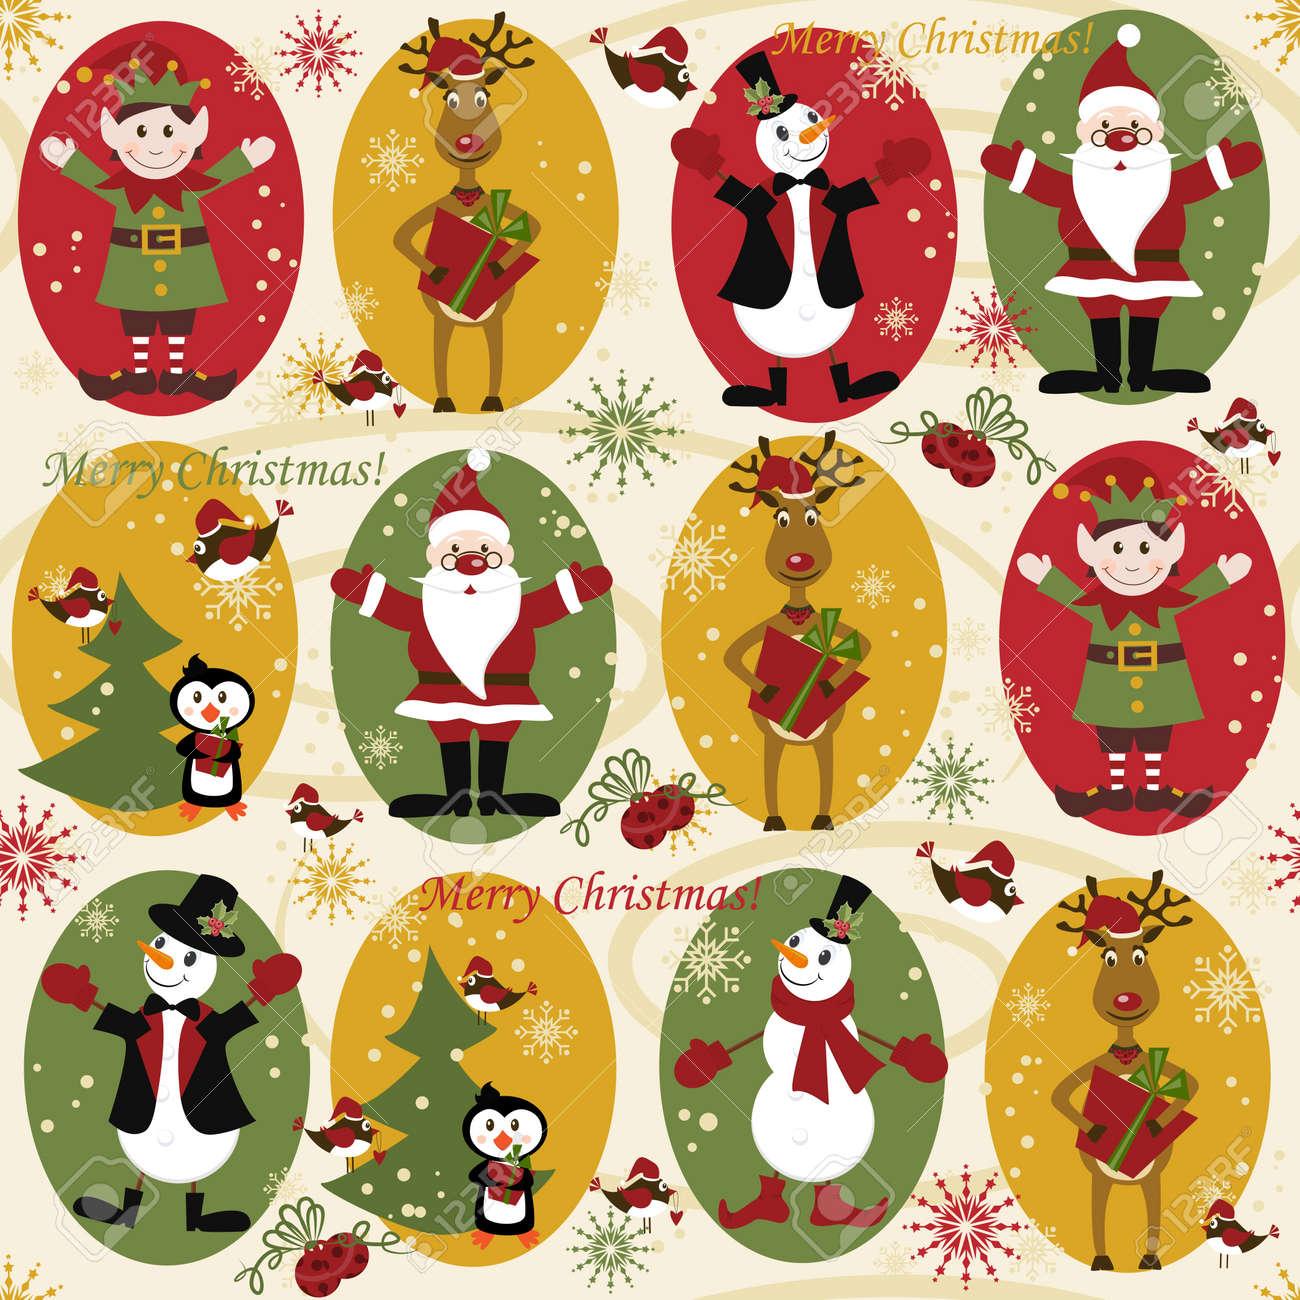 Christmas seamless pattern with balls , deer, Santa, elf, deer,bell, tree and present Stock Vector - 9658128